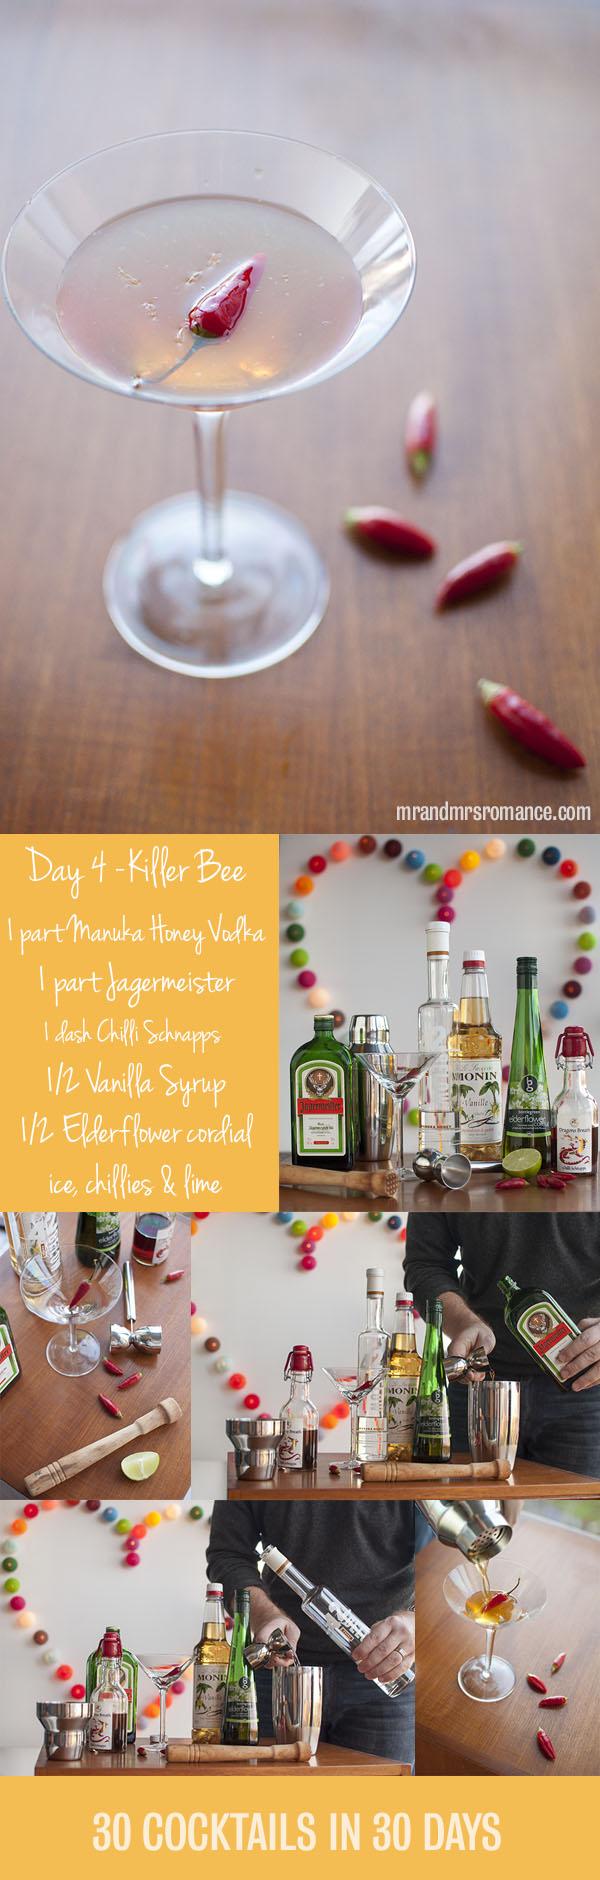 Killer Bee honey vodka cocktail recipe